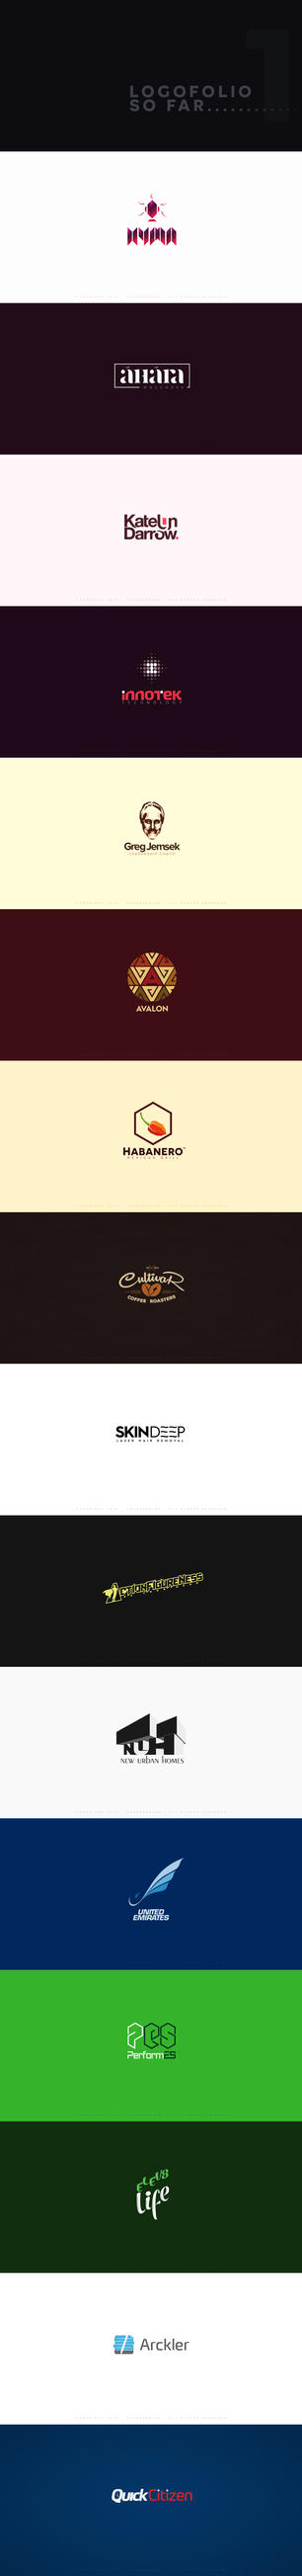 LogoFolio 1 by CaJoE-Design